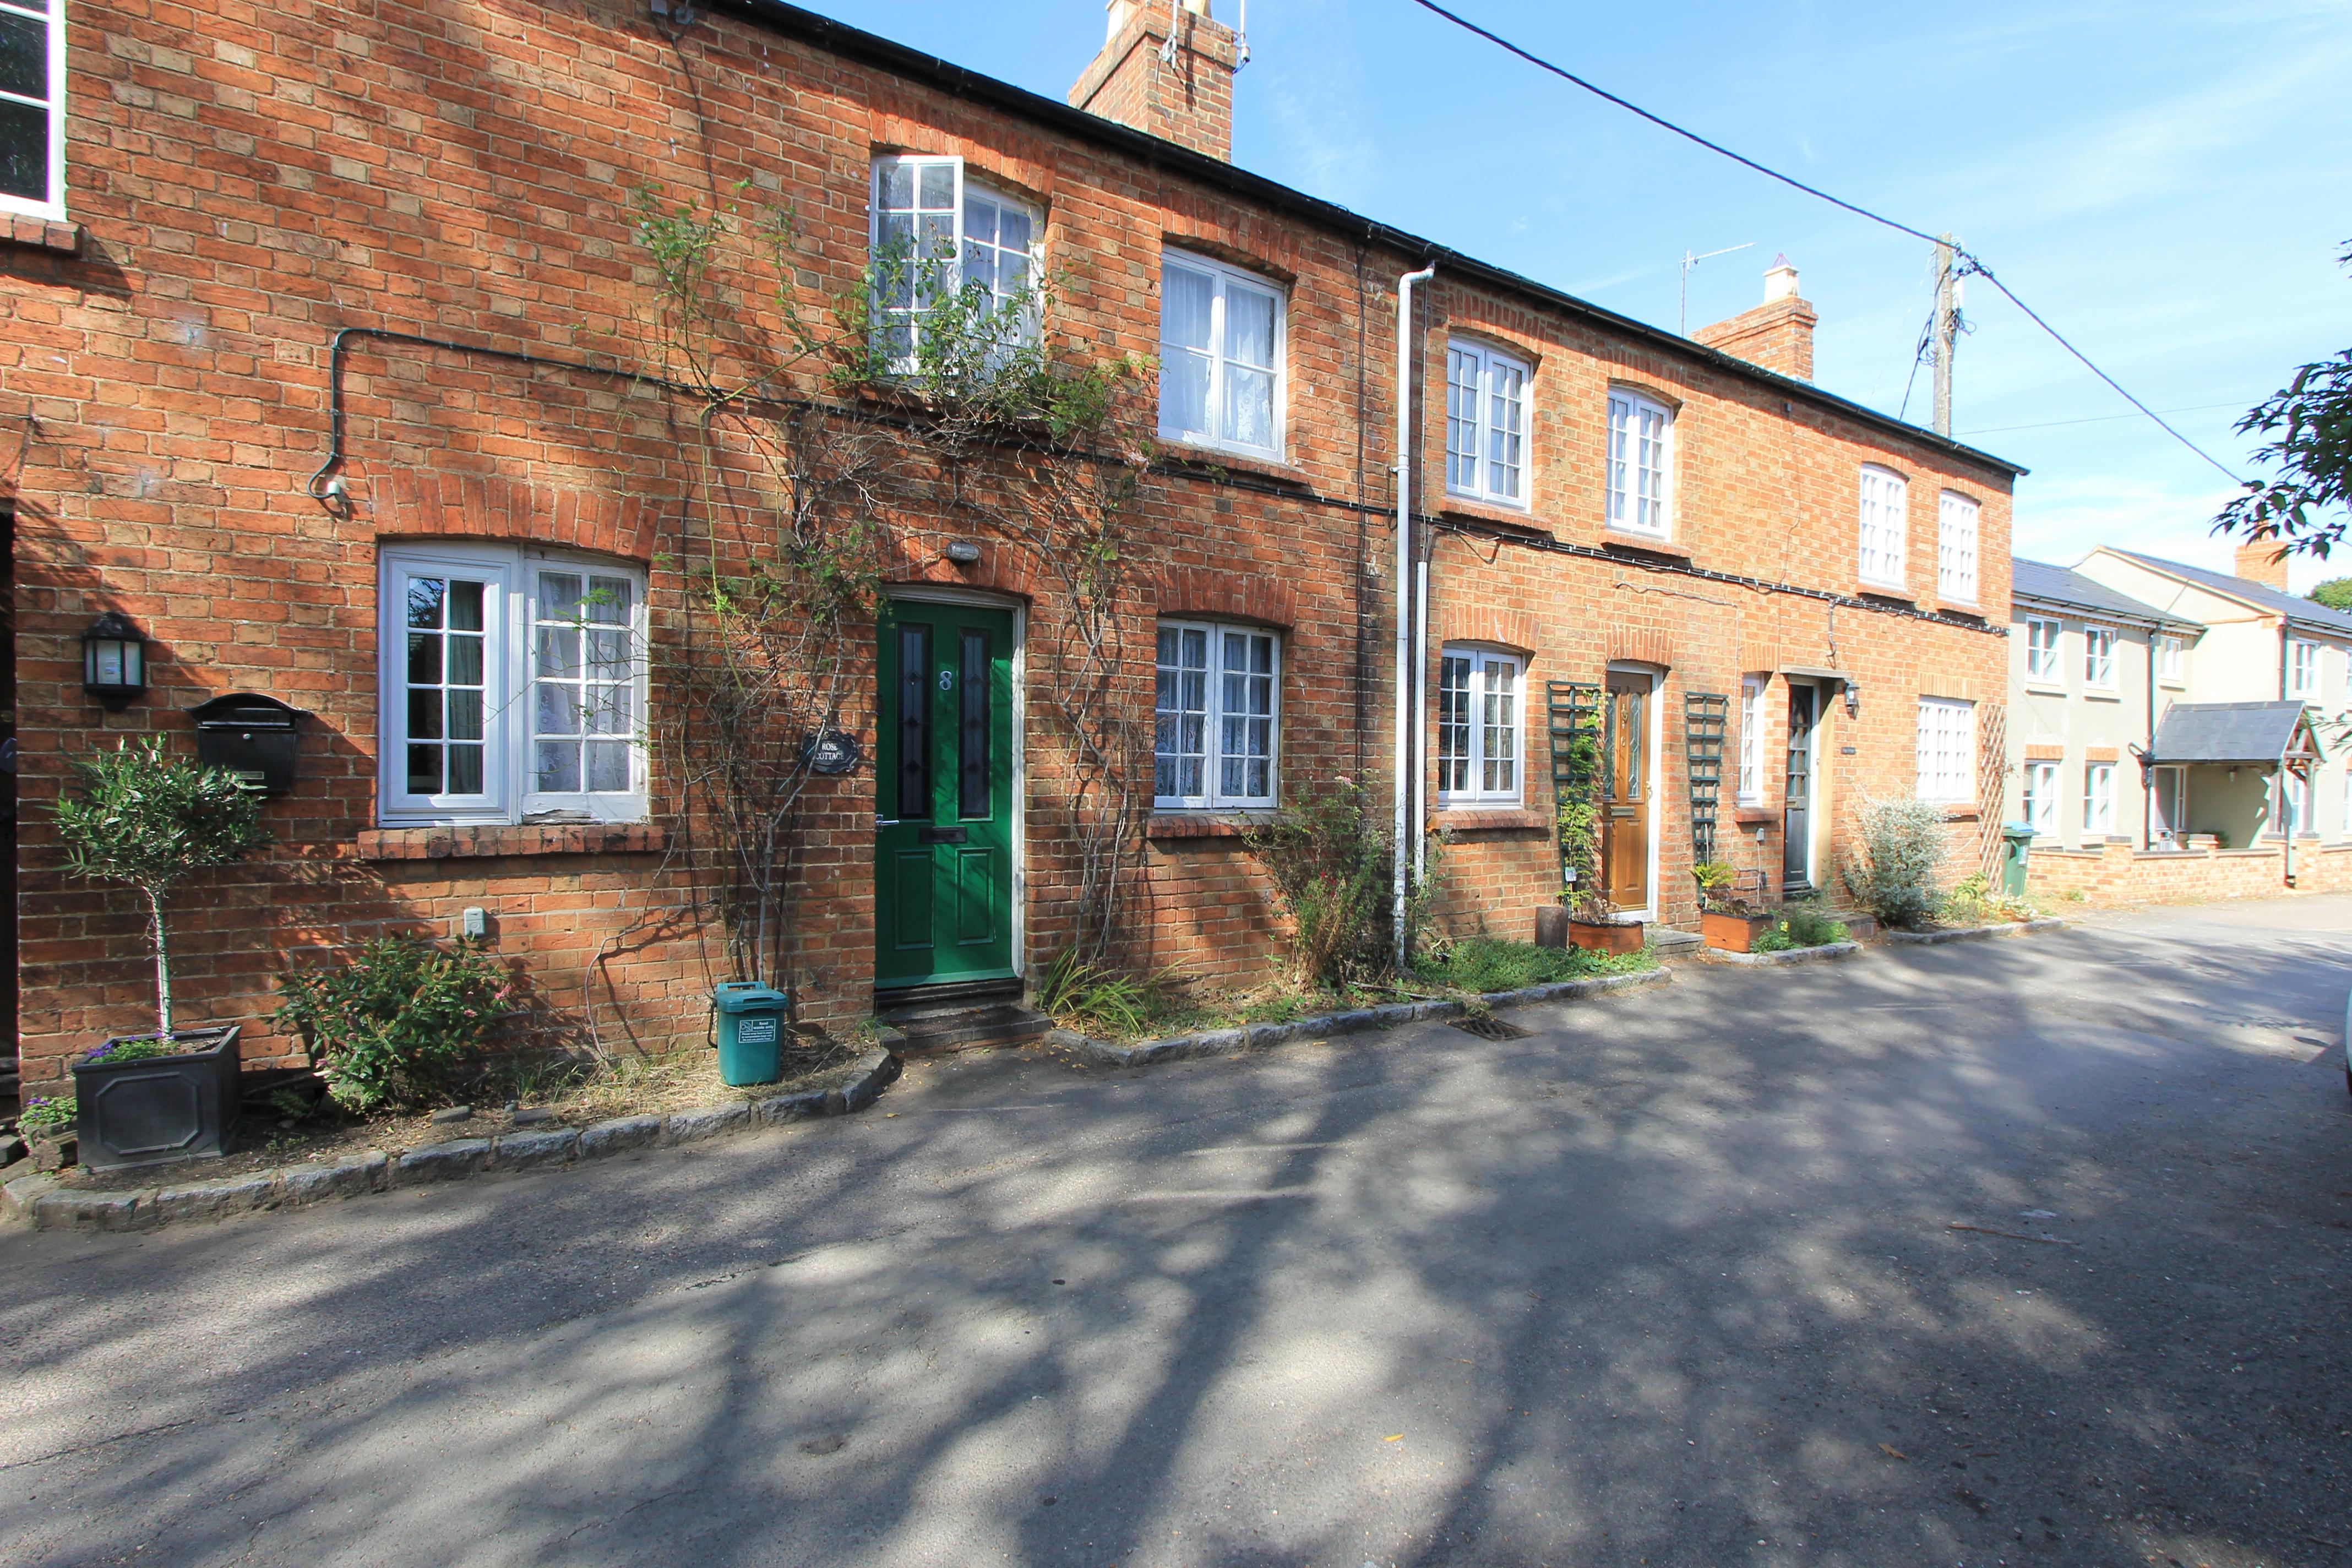 Vicarage Road, Milton Keynes, Buckinghamshire Image